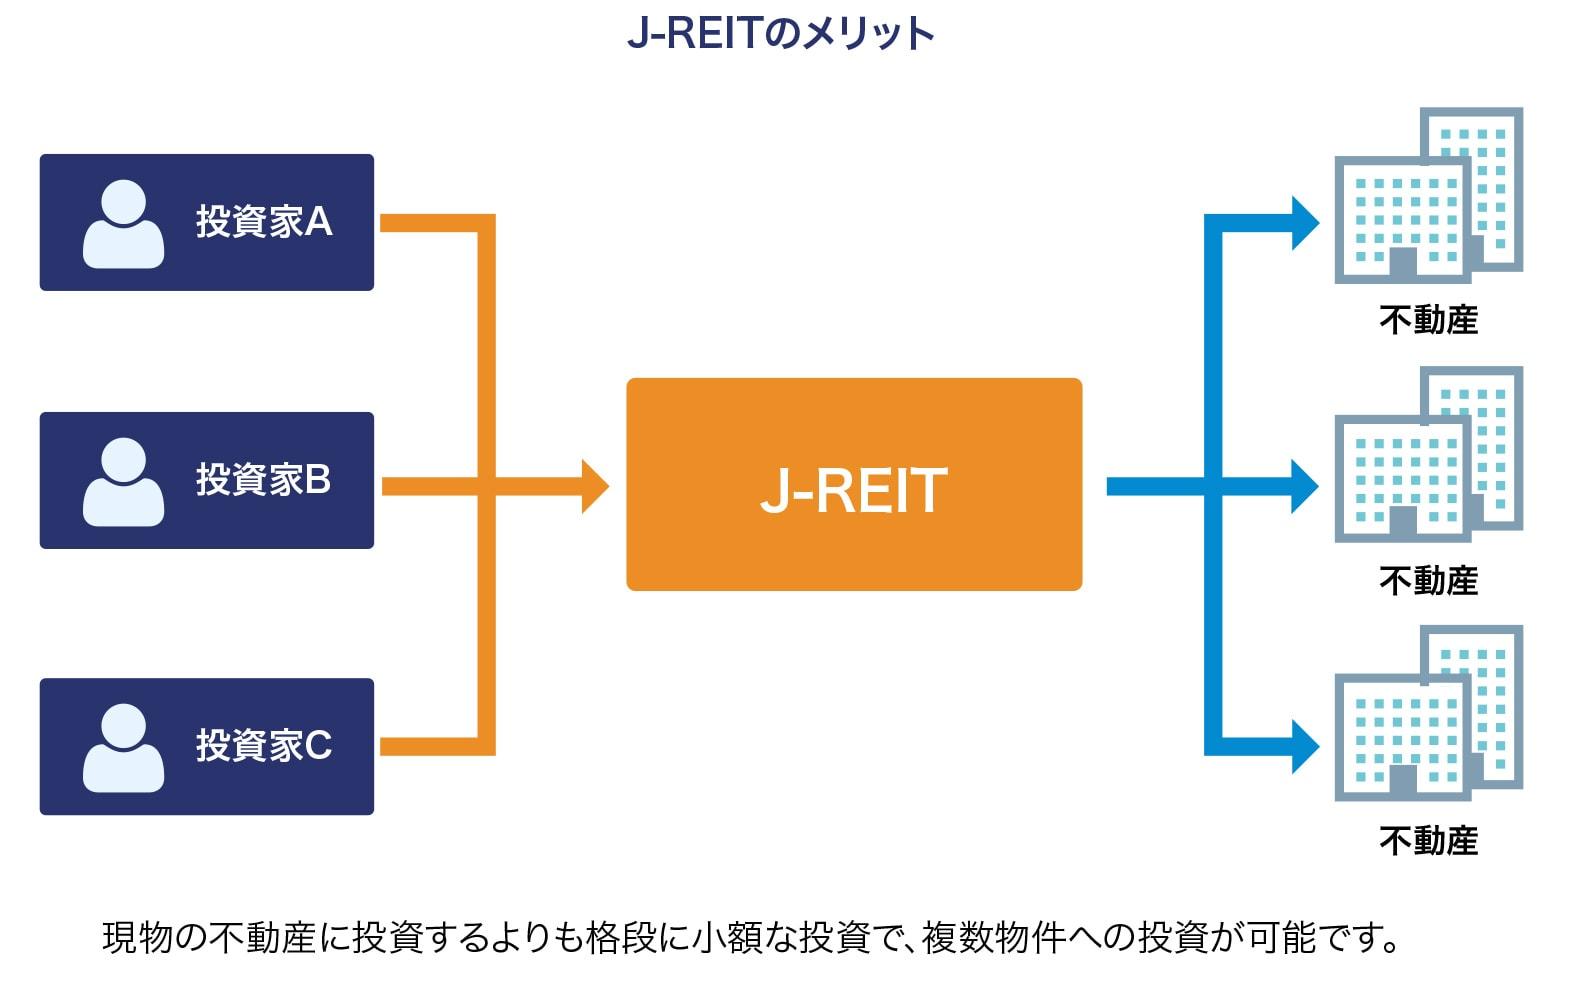 J-REIT